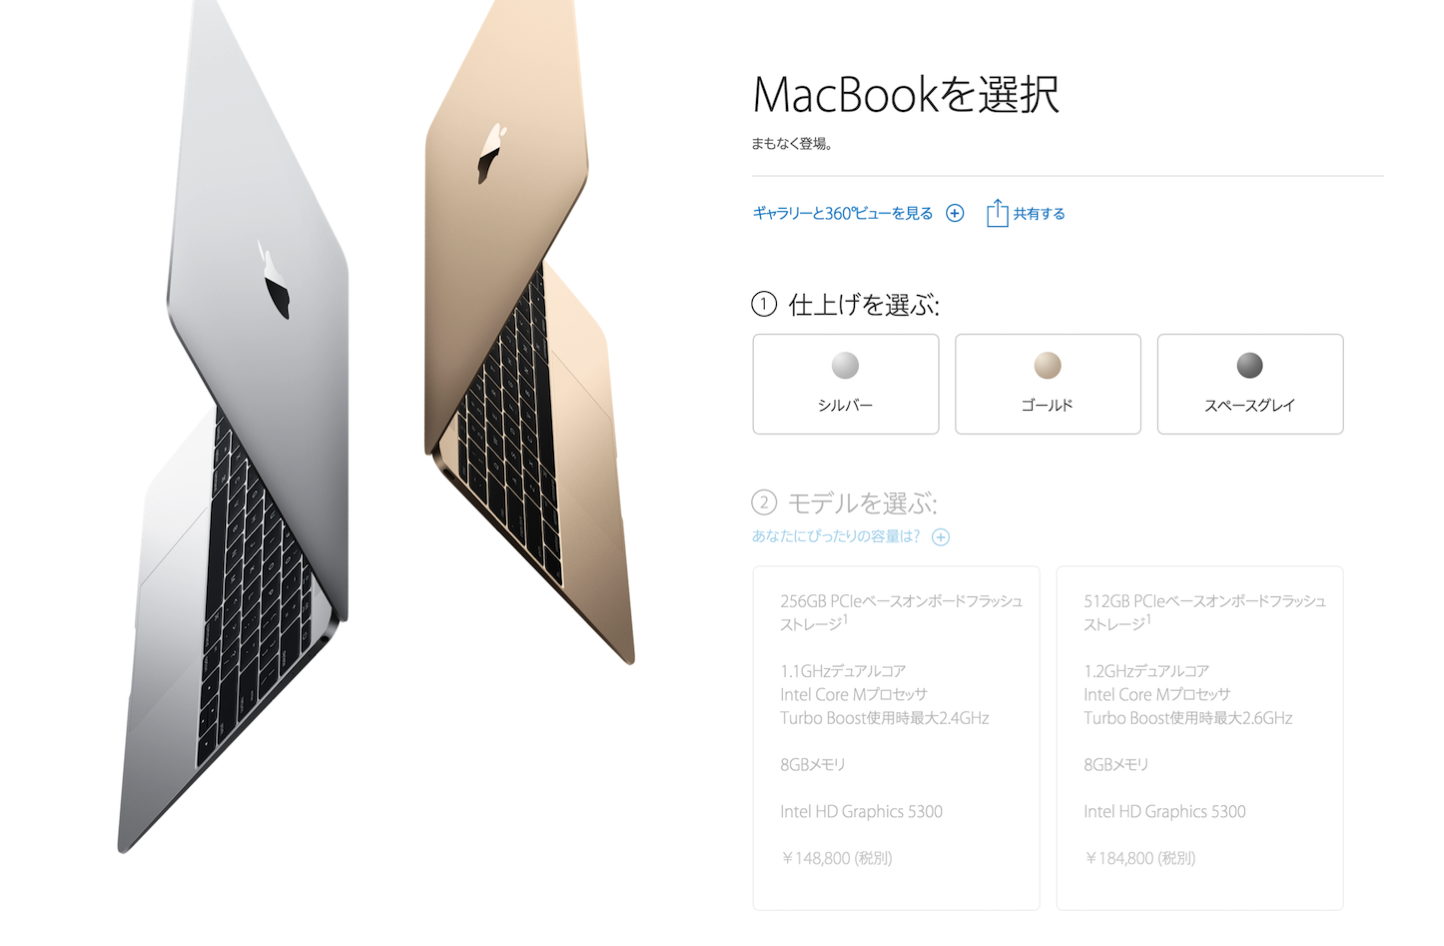 Buying the new macbook